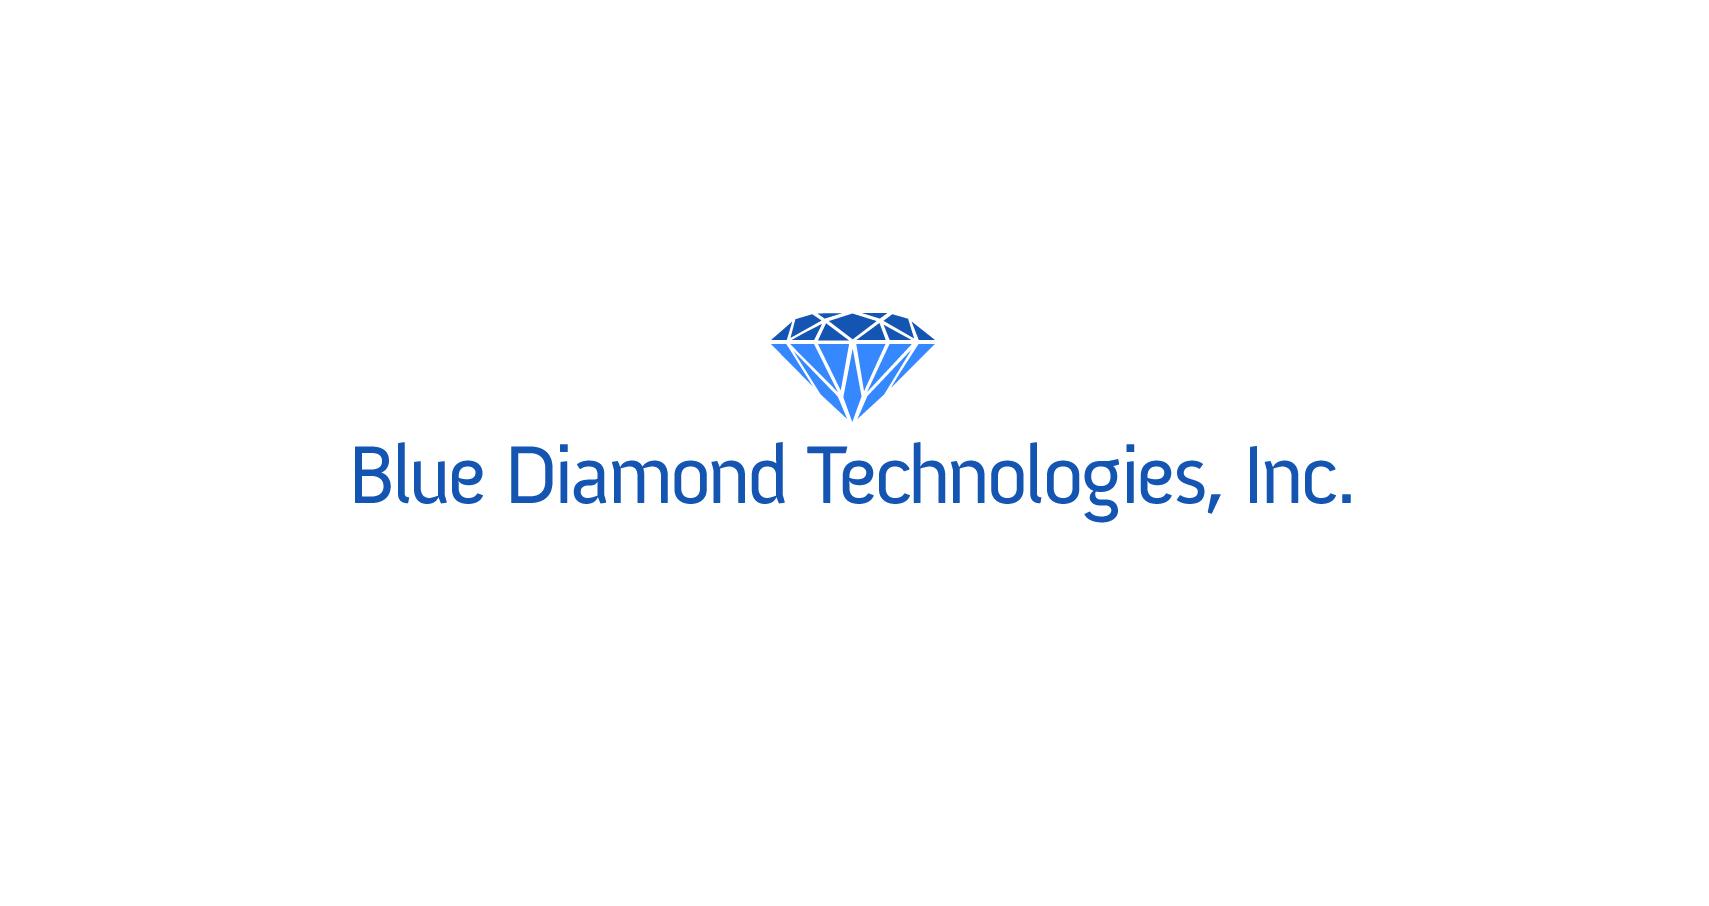 Blue Diamond Technologies logo